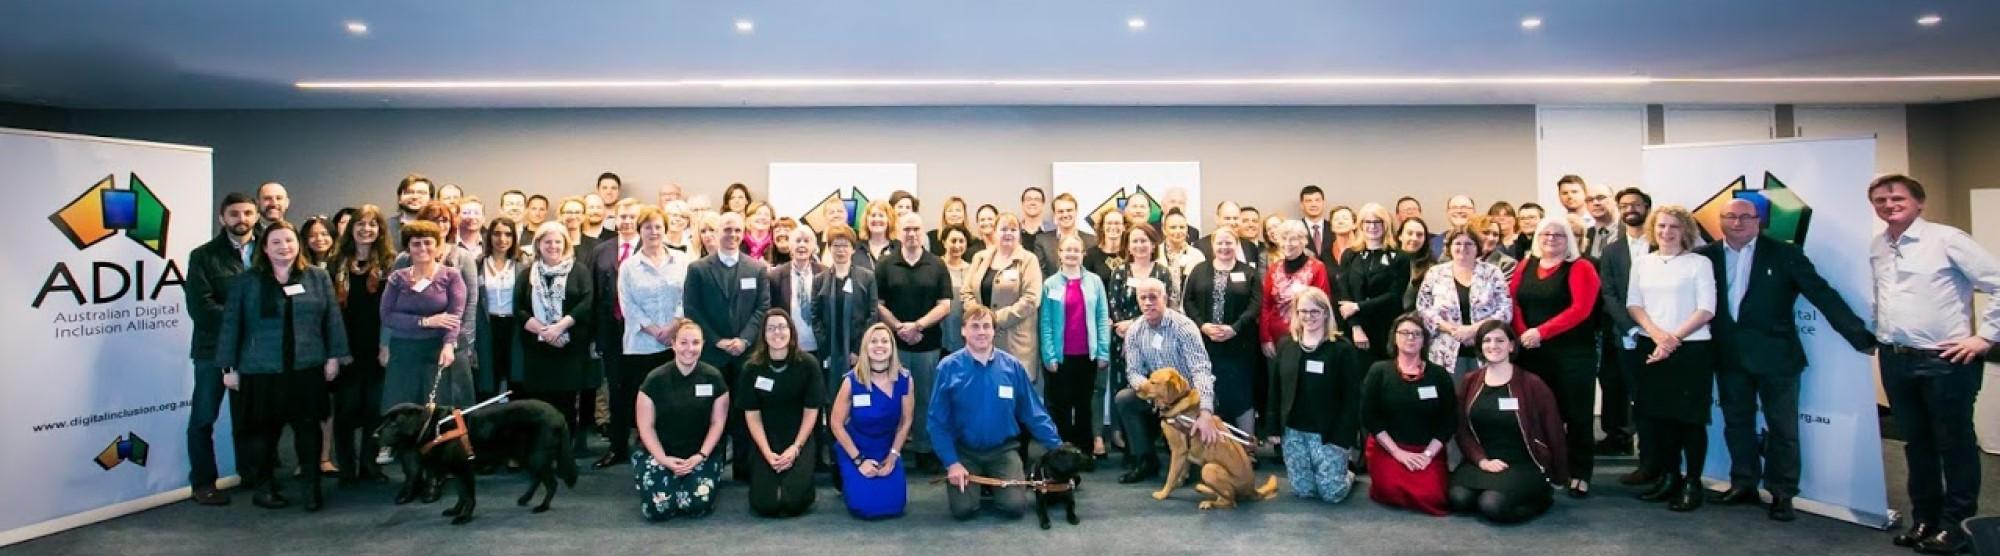 Australian Digital Inclusion Alliance